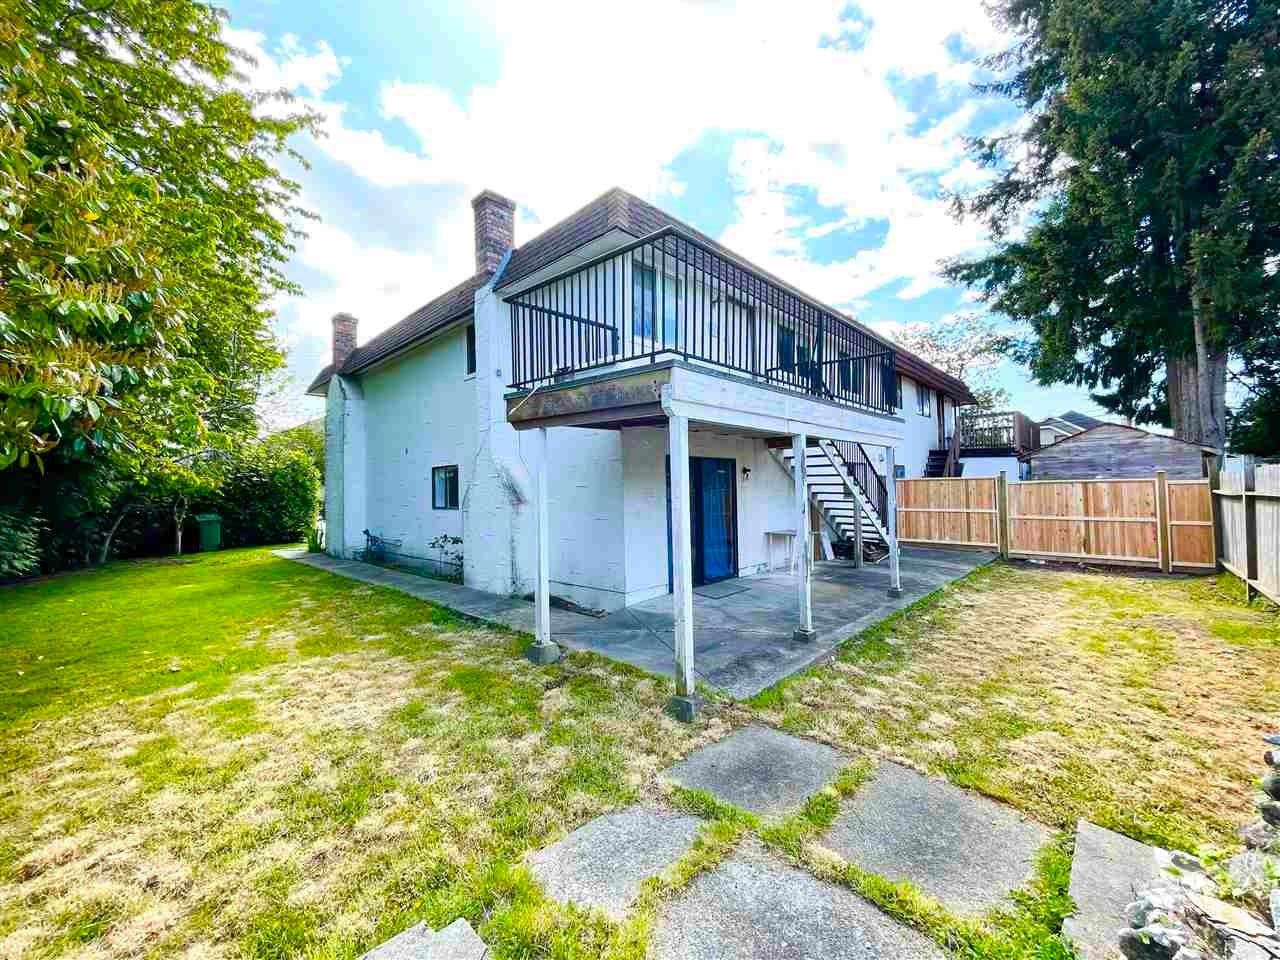 8991 ST. ALBANS ROAD - Garden City 1/2 Duplex for sale, 5 Bedrooms (R2576083) - #20